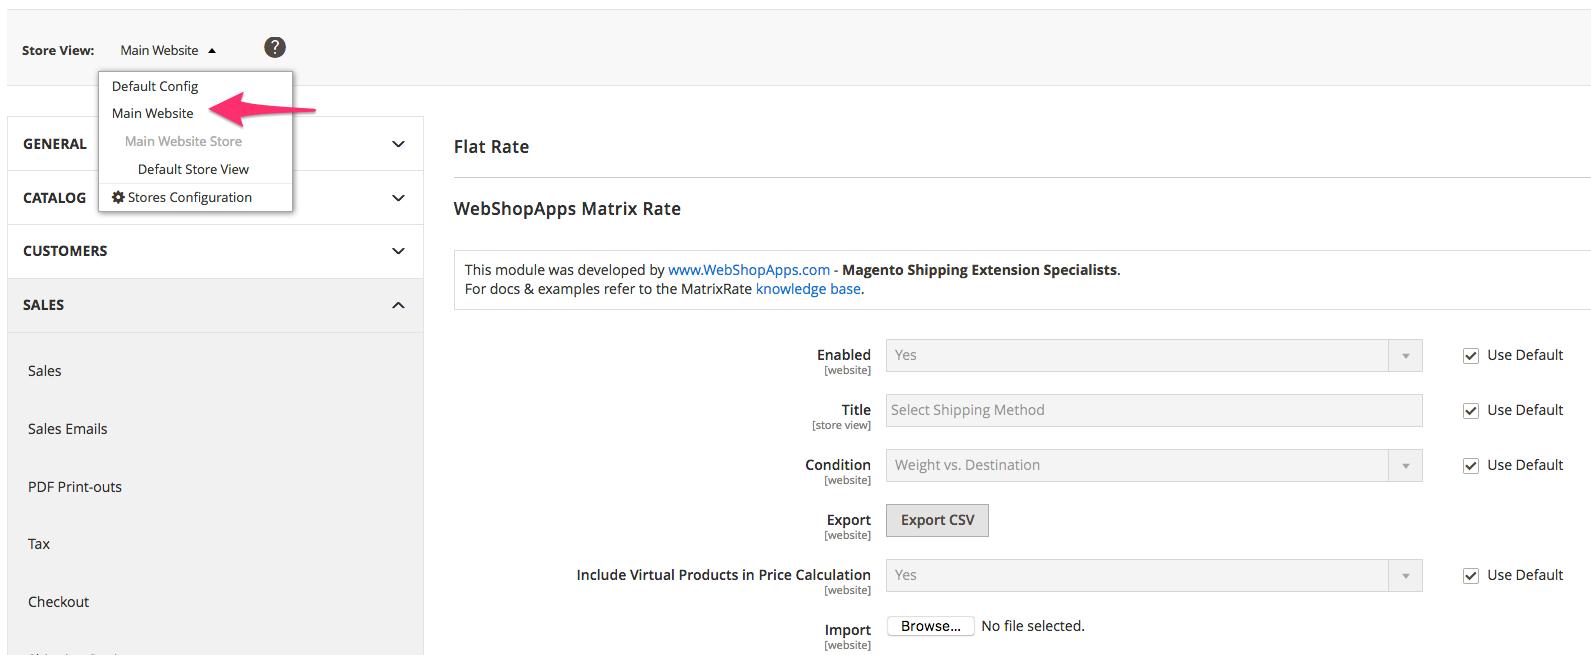 webshopapps matrixrate